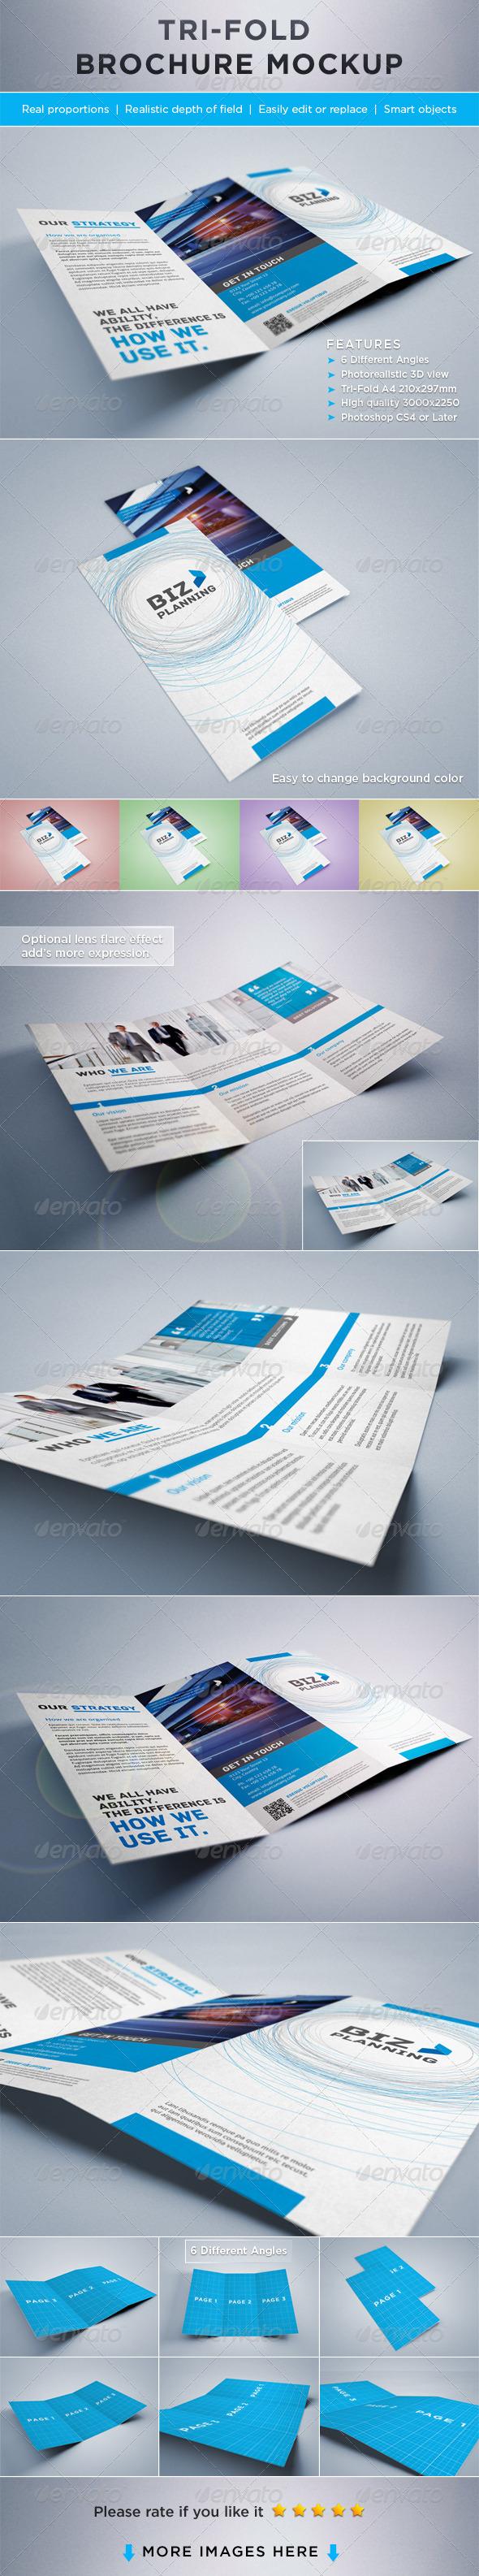 Photorealistic Tri-Fold Brochure Mock-ups